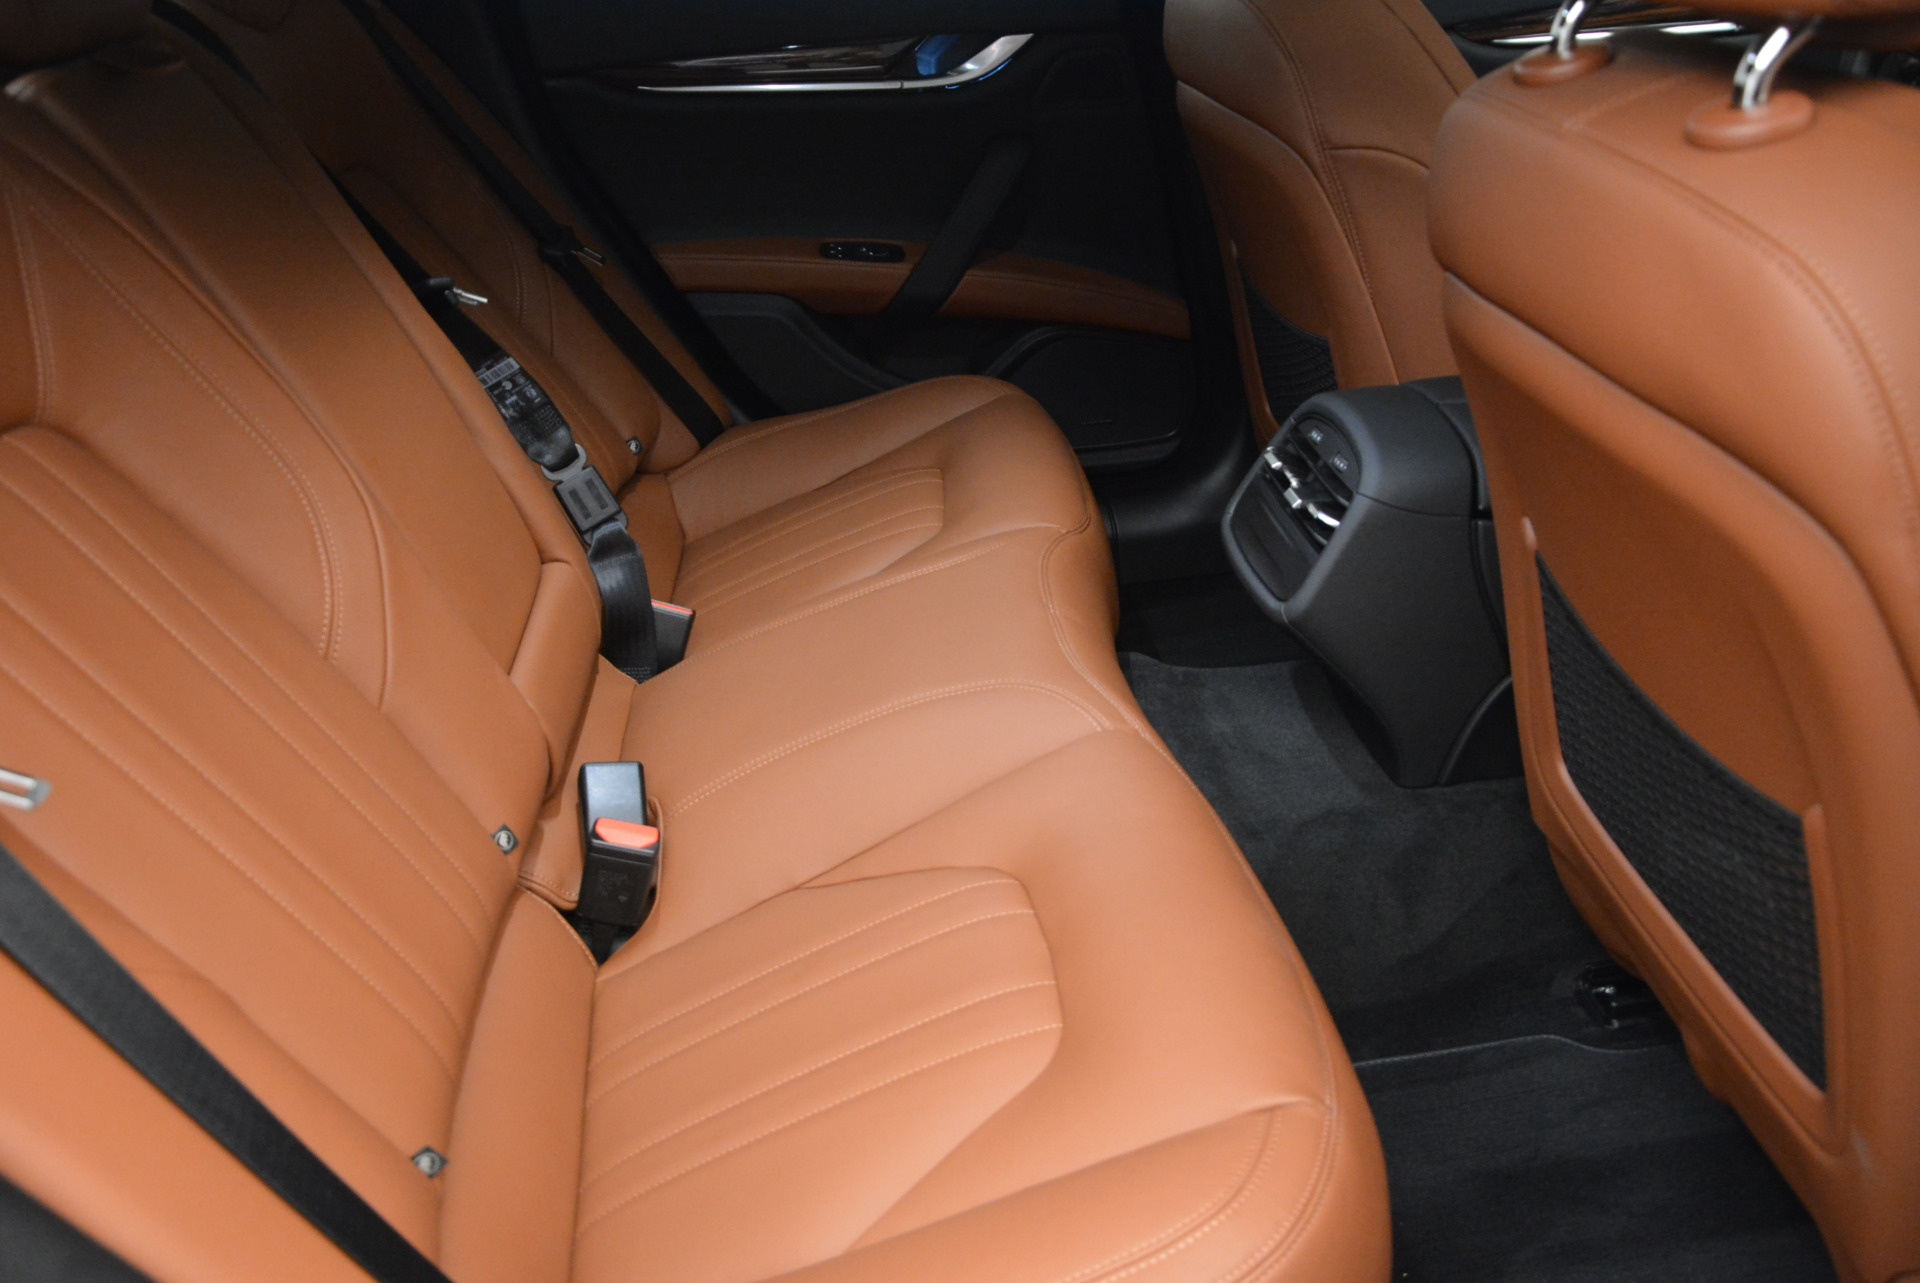 Used 2017 Maserati Ghibli S Q4 - EX Loaner For Sale In Greenwich, CT. Alfa Romeo of Greenwich, M1662 568_p23